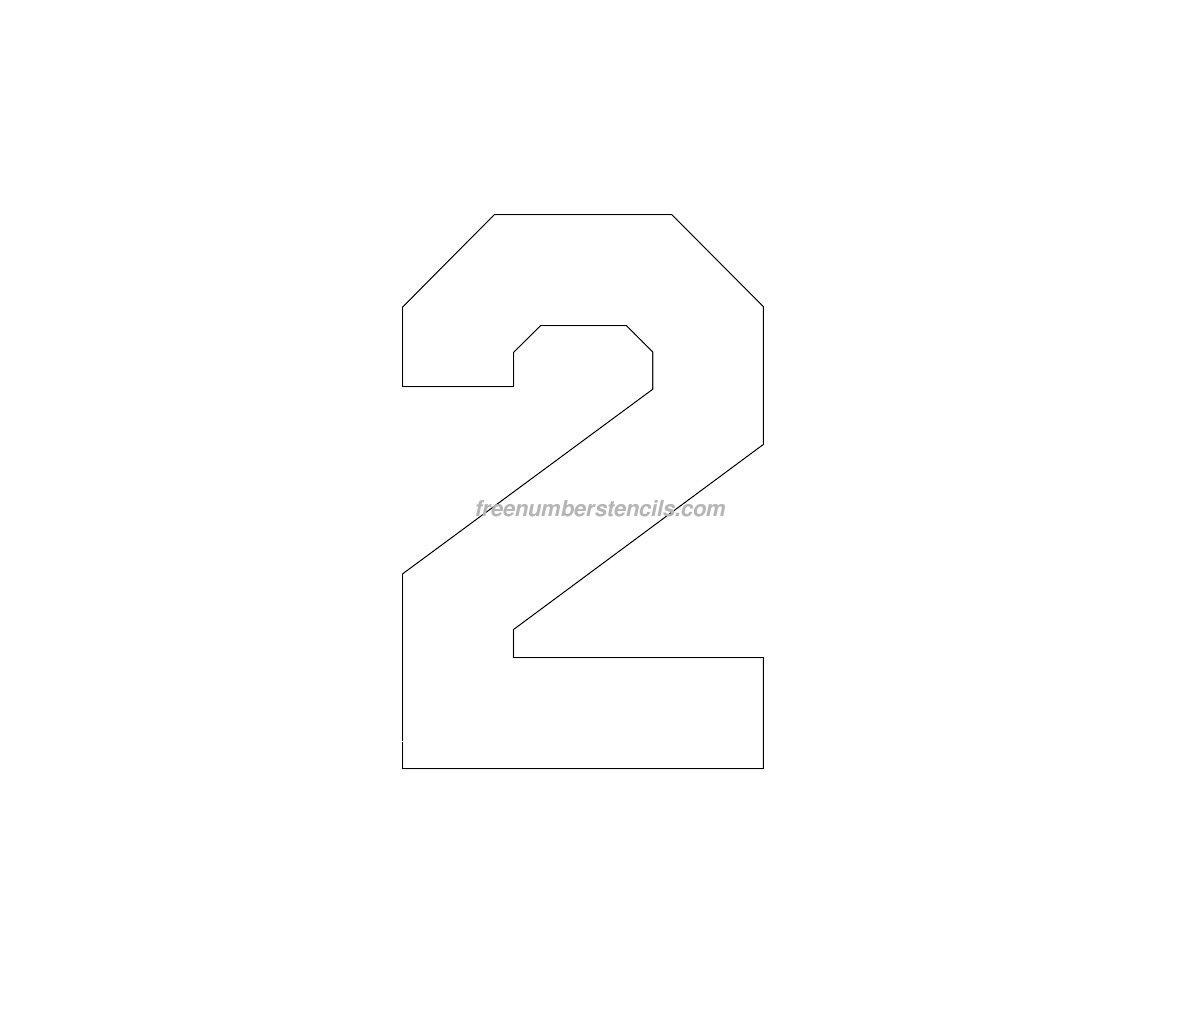 Free Jersey Printable 70 Number Stencil - Freenumberstencils.com